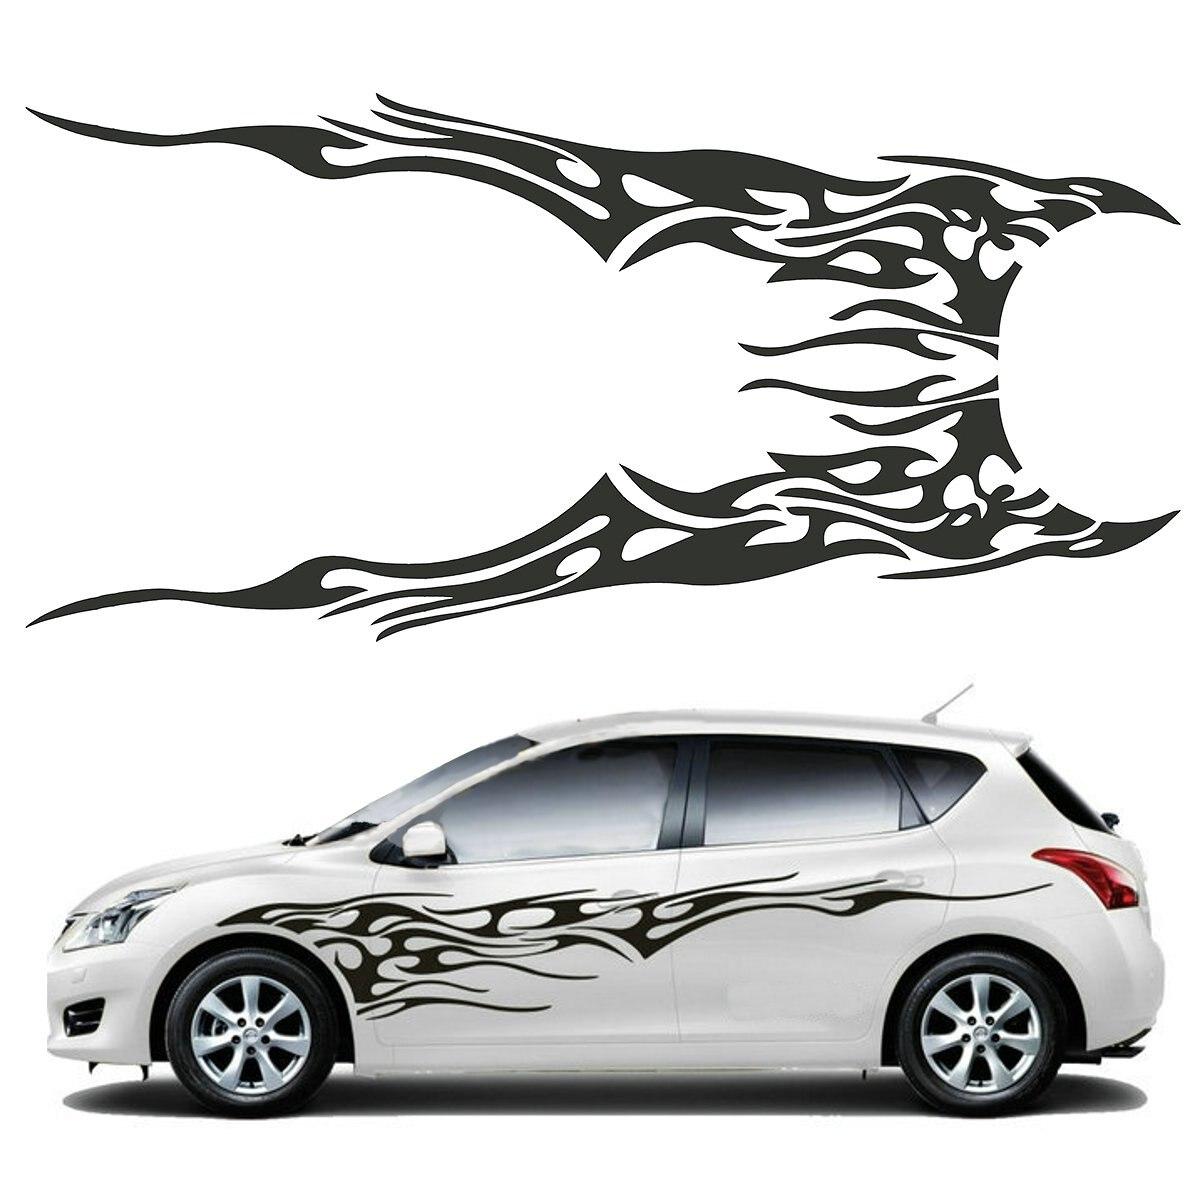 Design a car sticker online - 2pcs 210 5x48cm Diy Flame Graphics Vinyl Car Side Sticker Decal Waterproof Black China